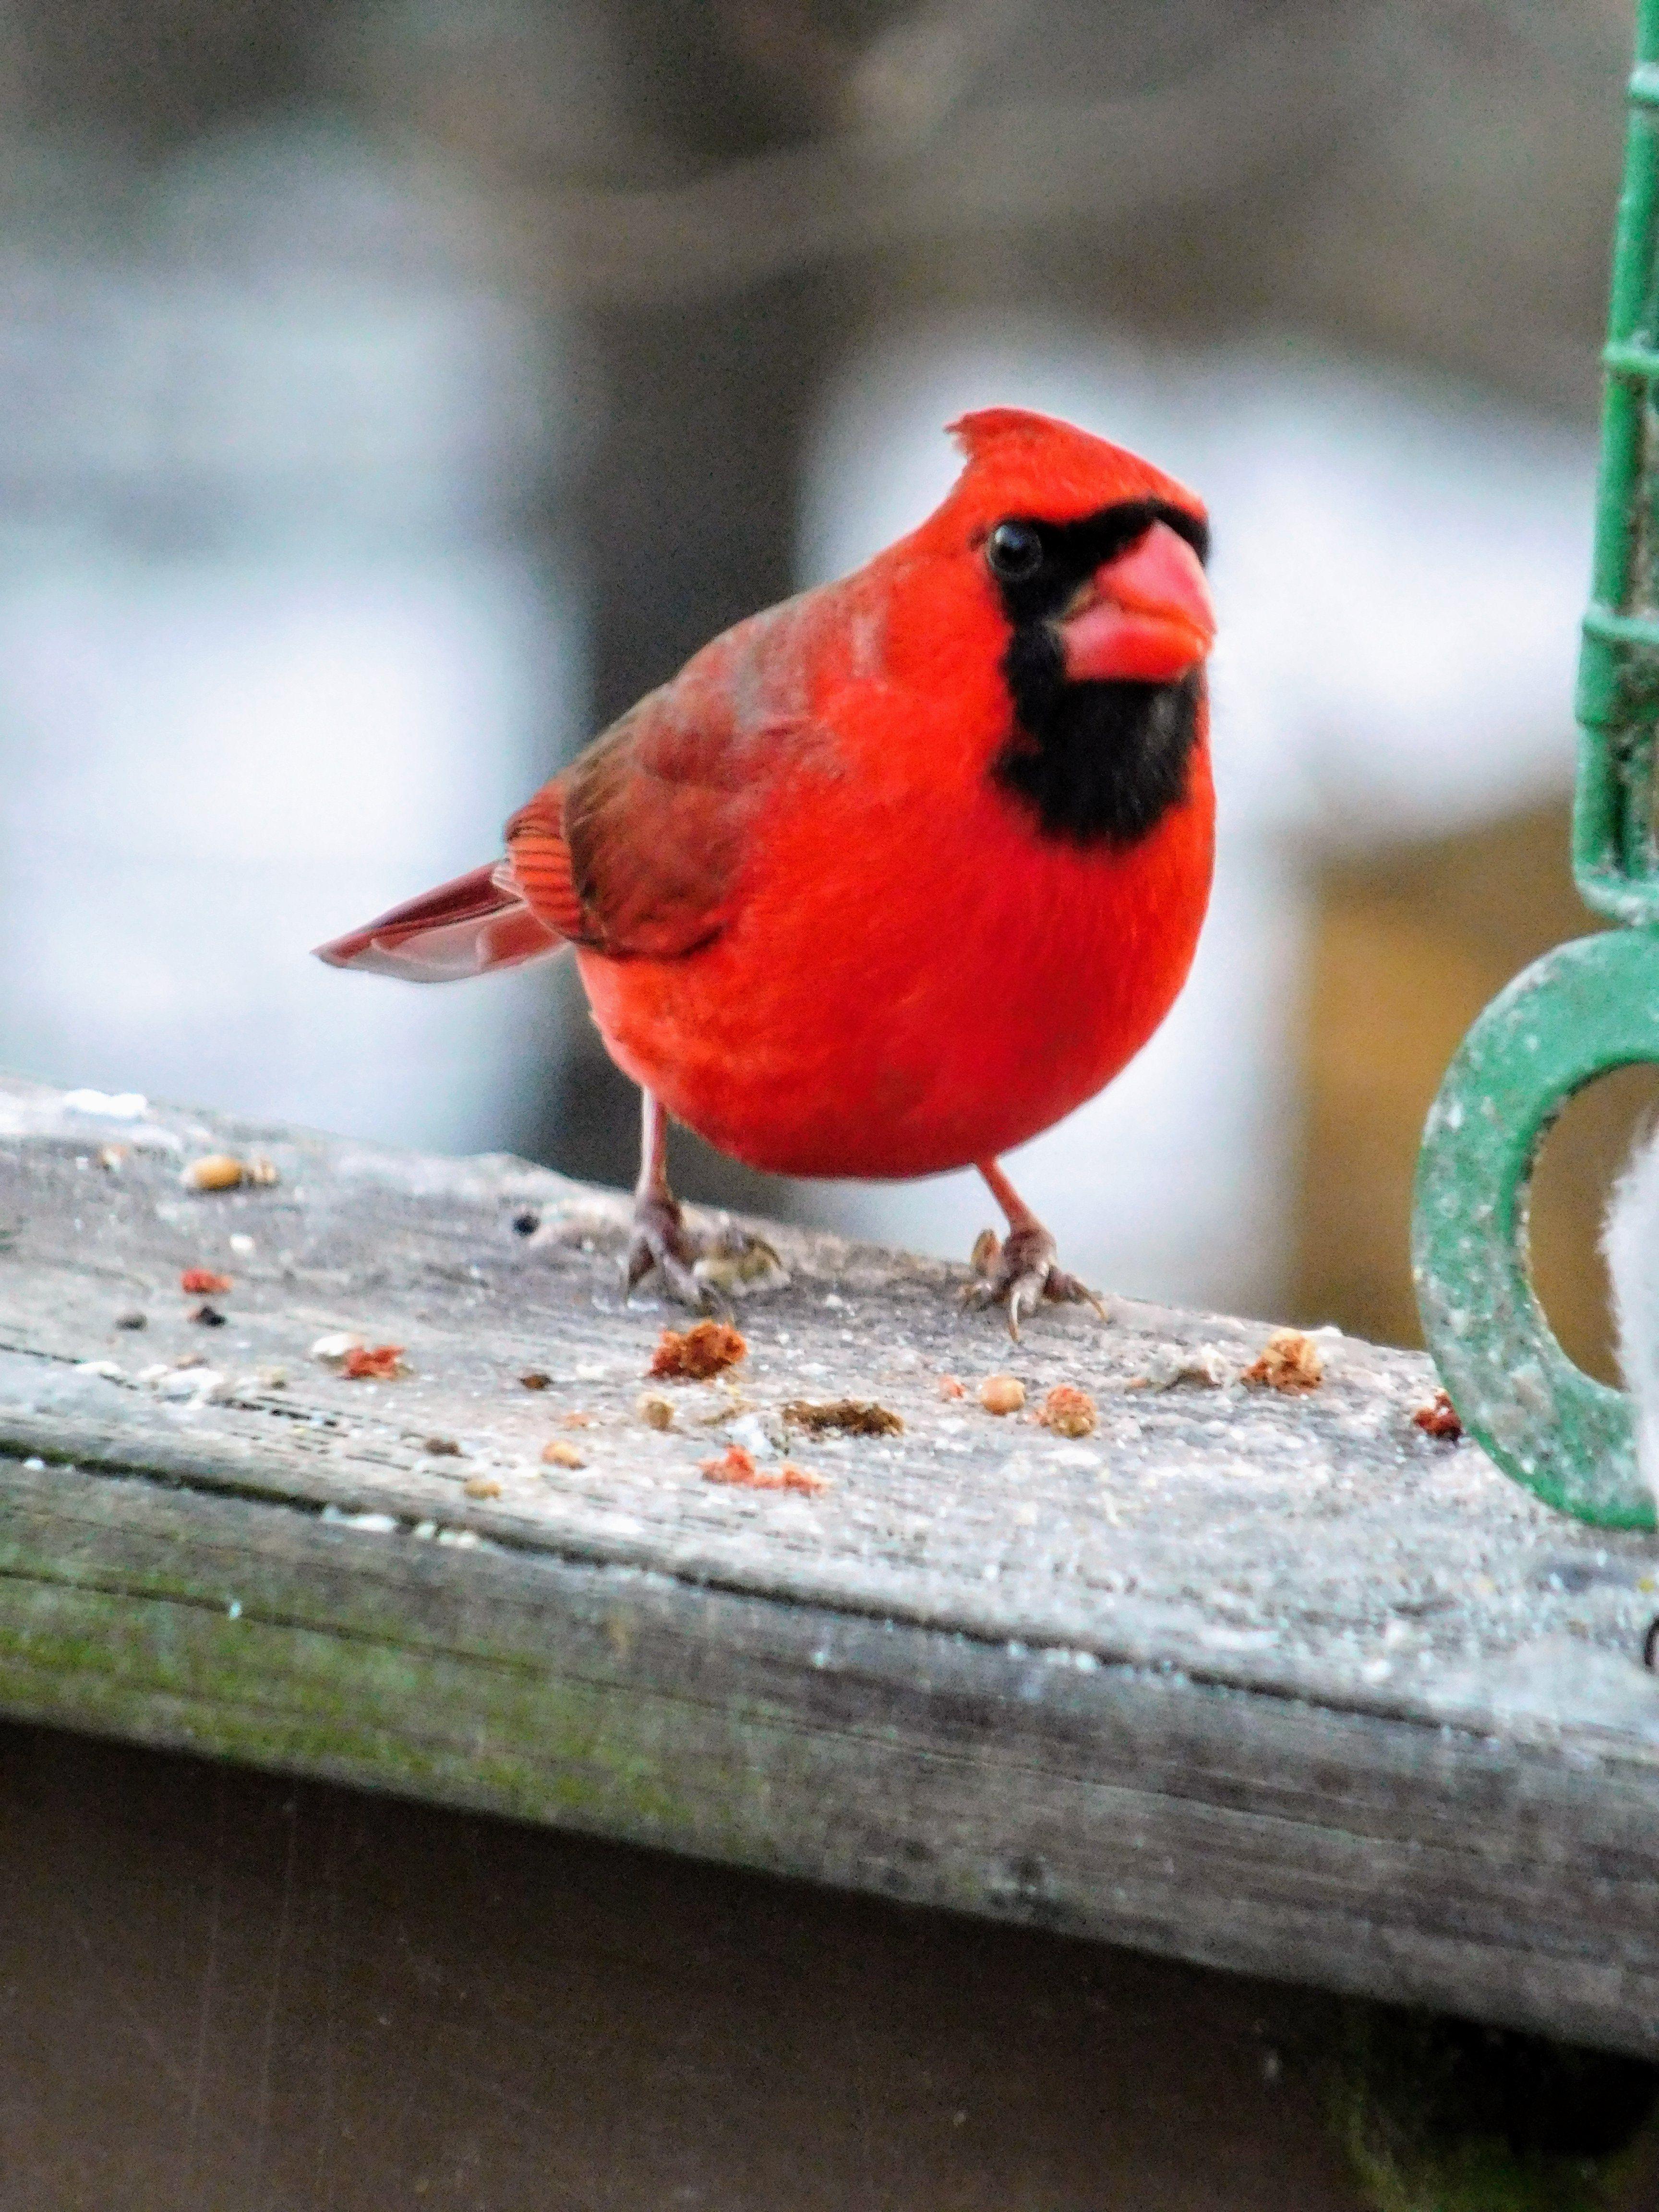 Male Winter Cardinal in N.J., USA photo by s.dorman